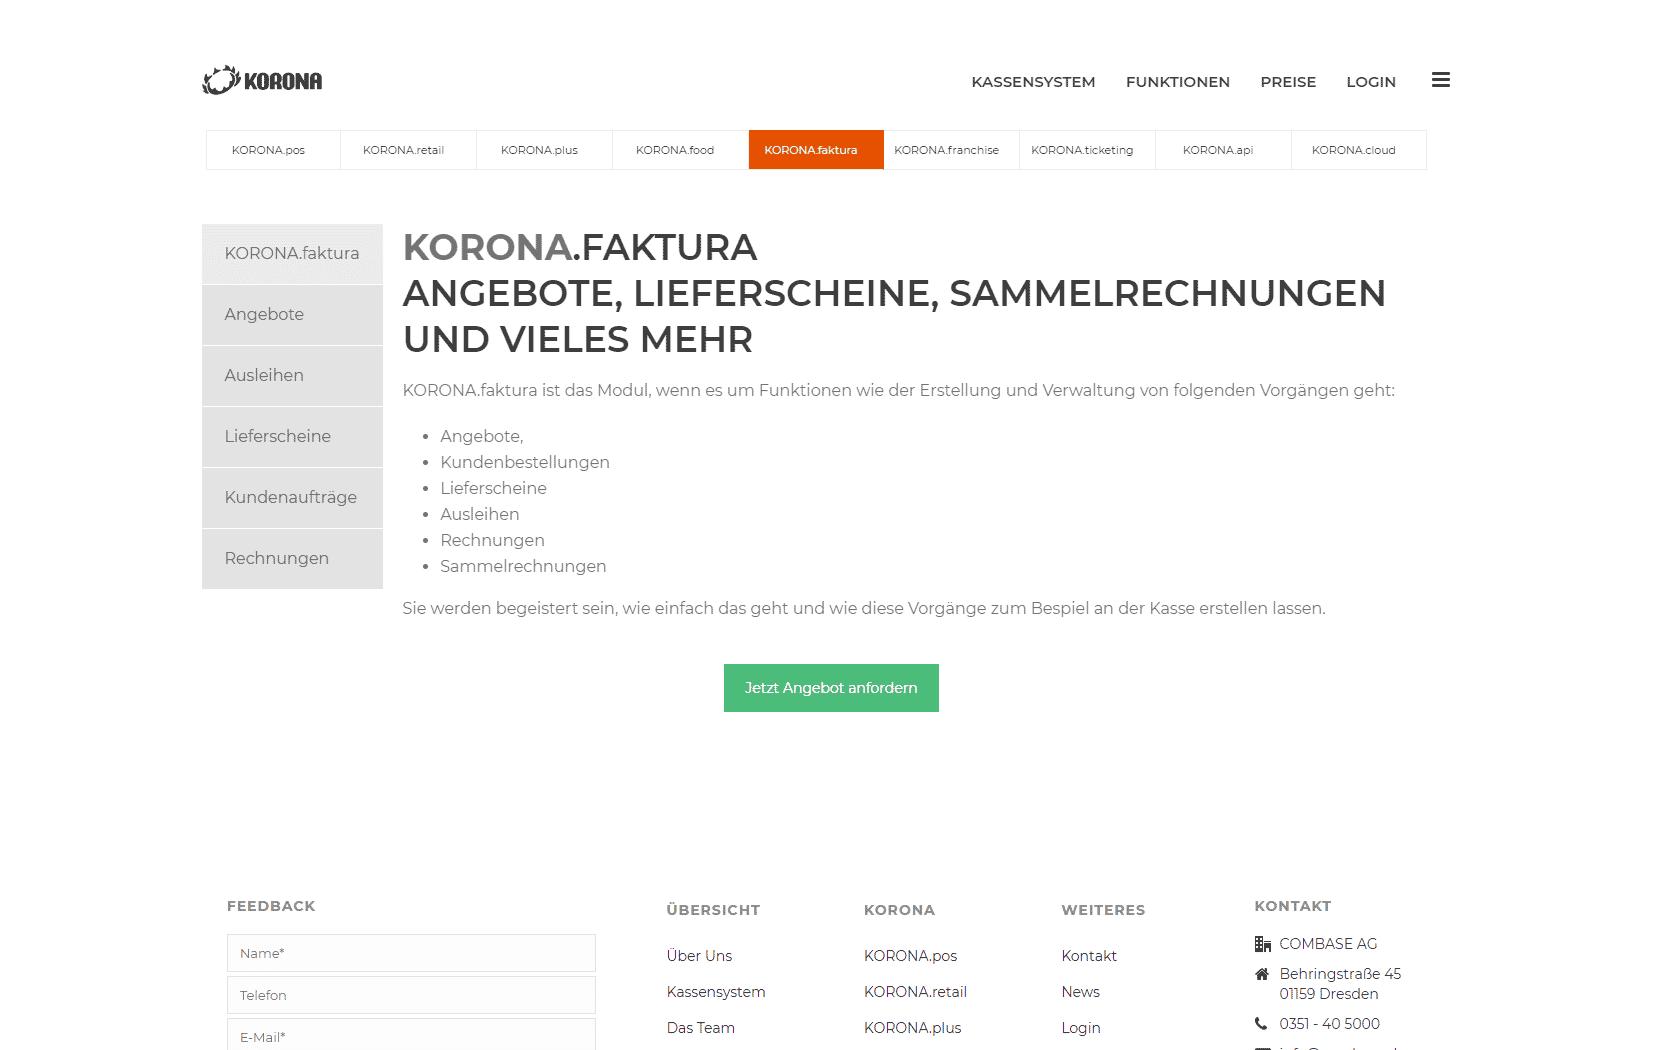 webdesigner webdesign korona kassensystem marketing bremen